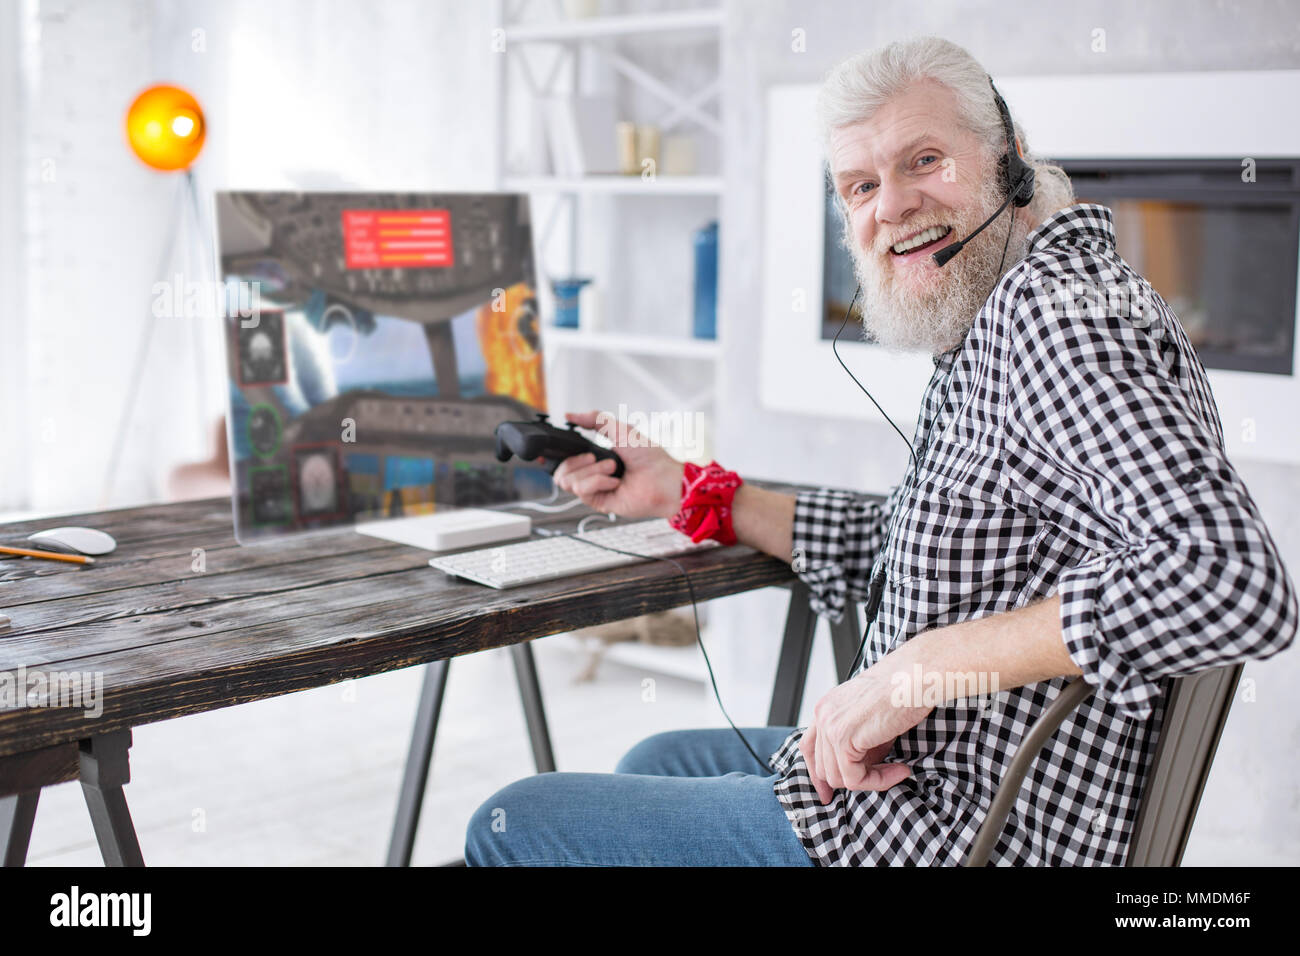 Cheerful senior man posing while playing aircraft battle simulator - Stock Image